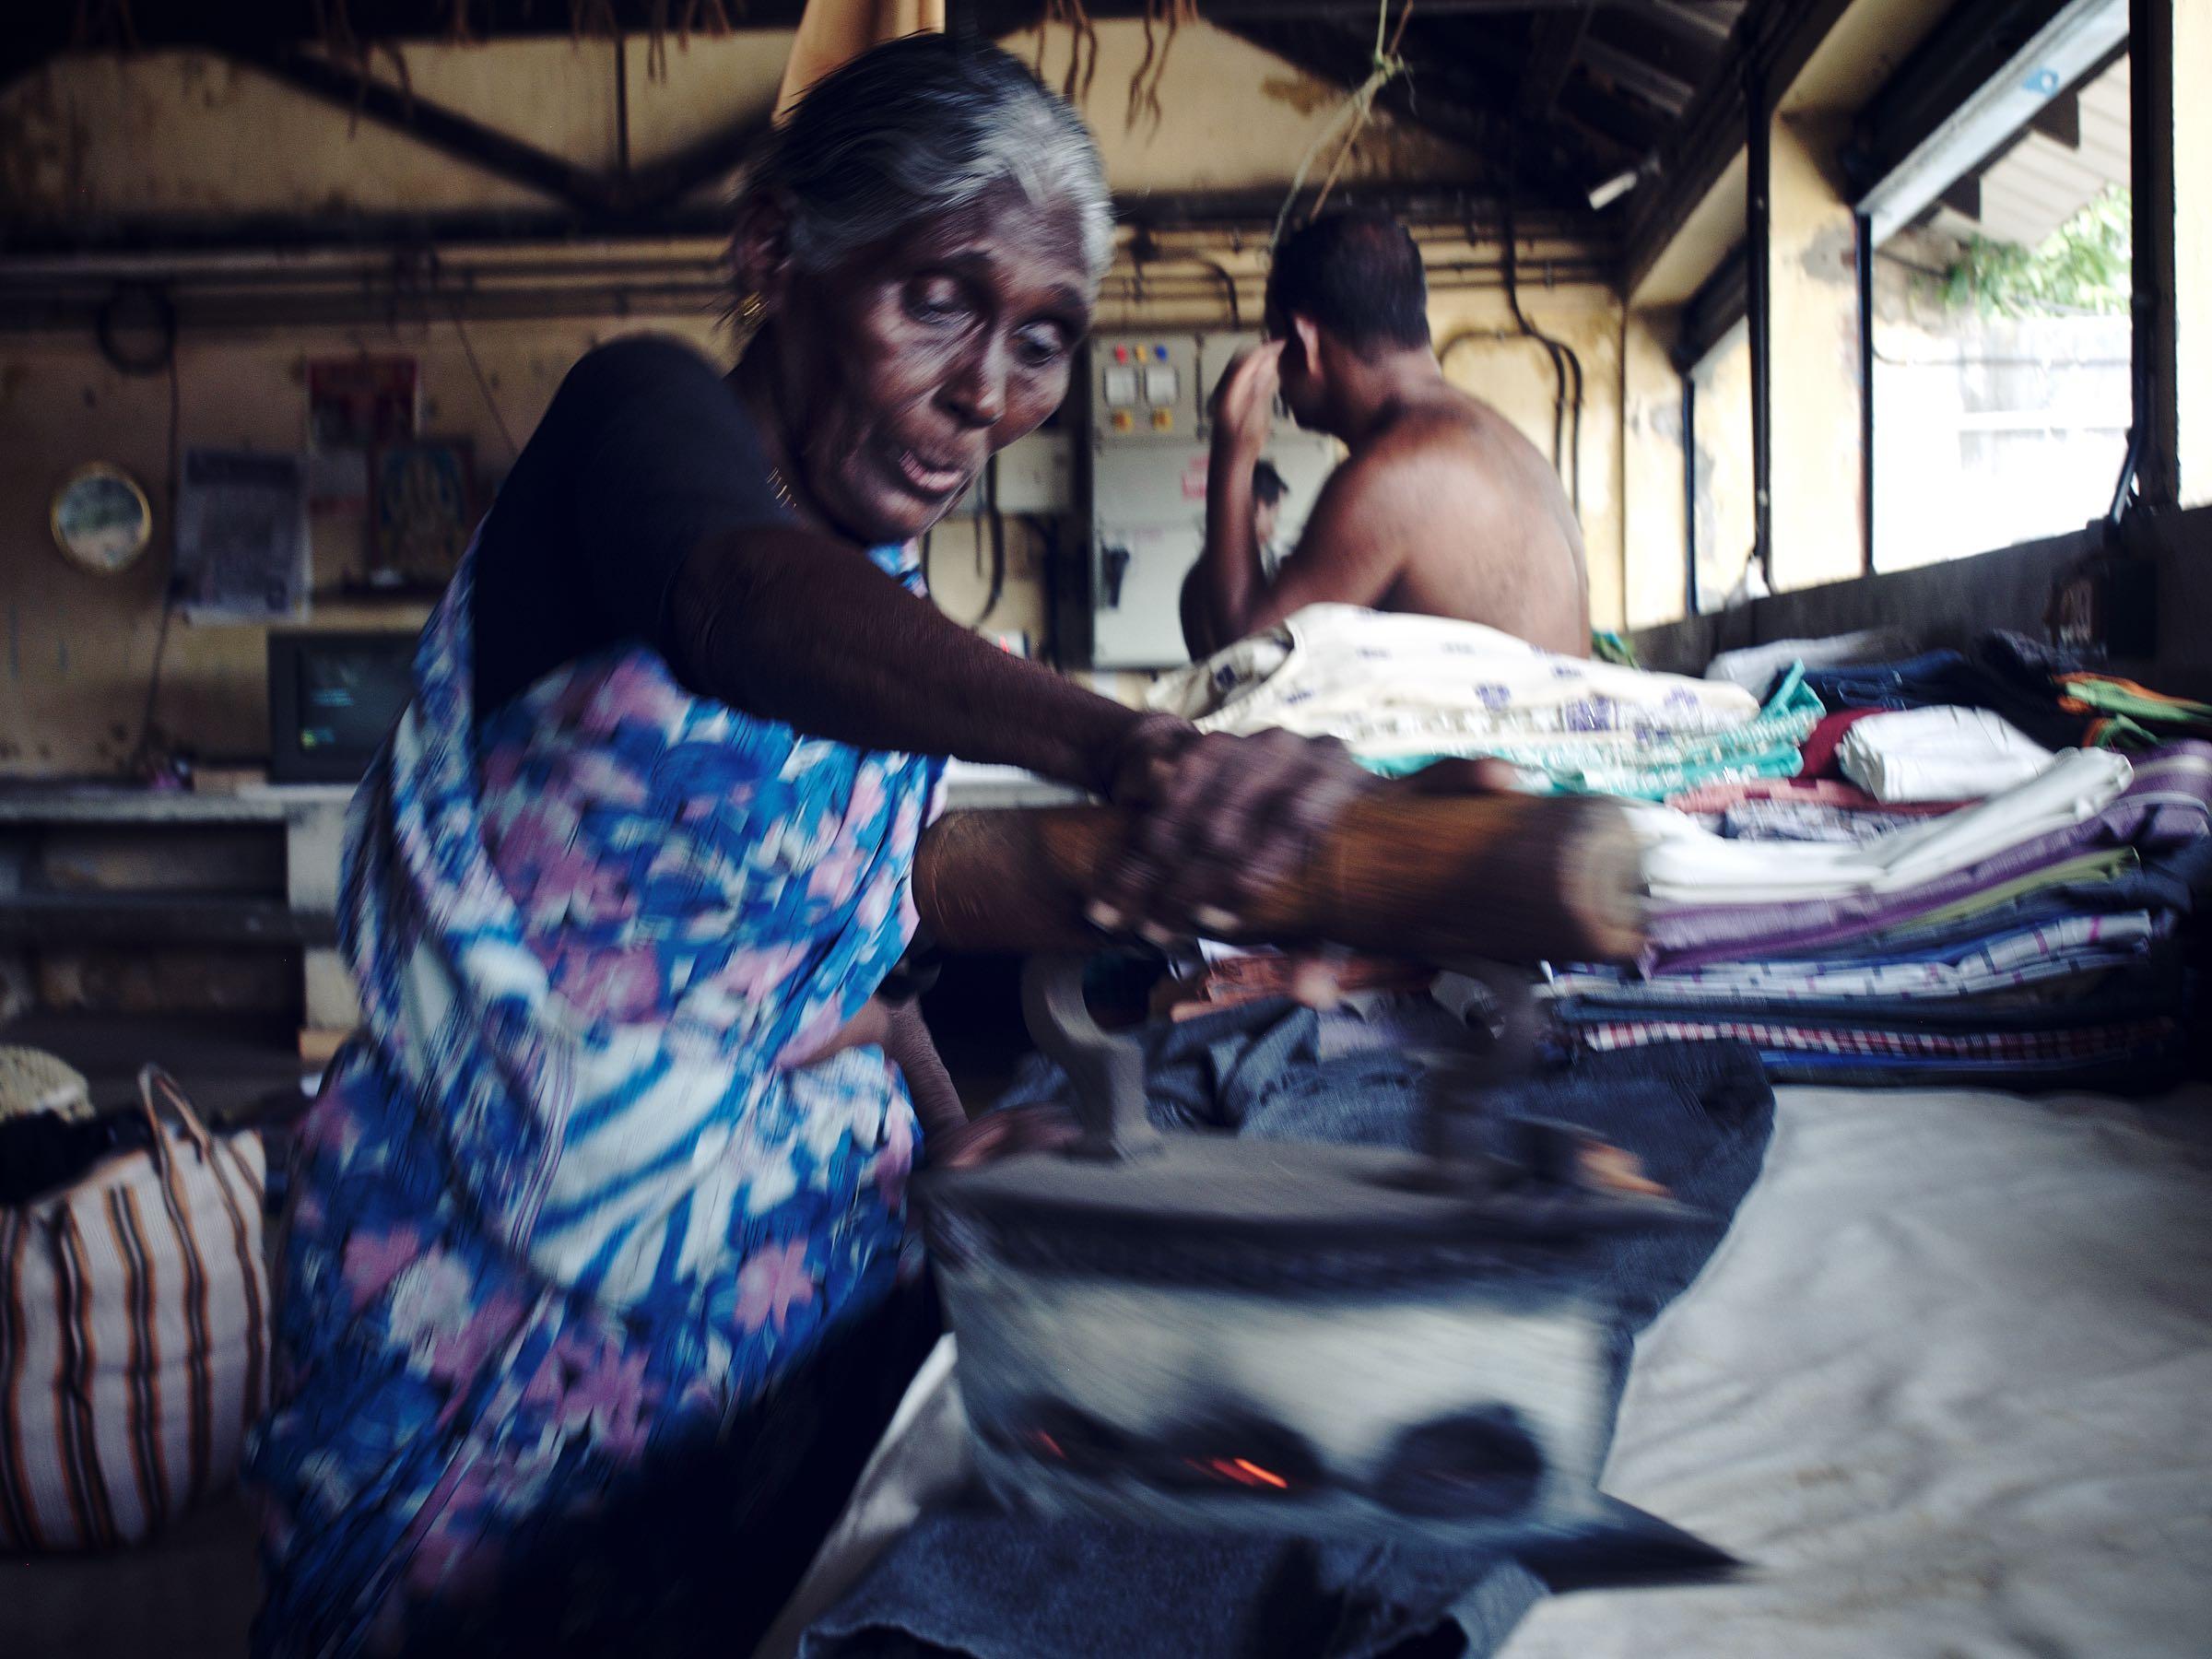 Traditional Ironing